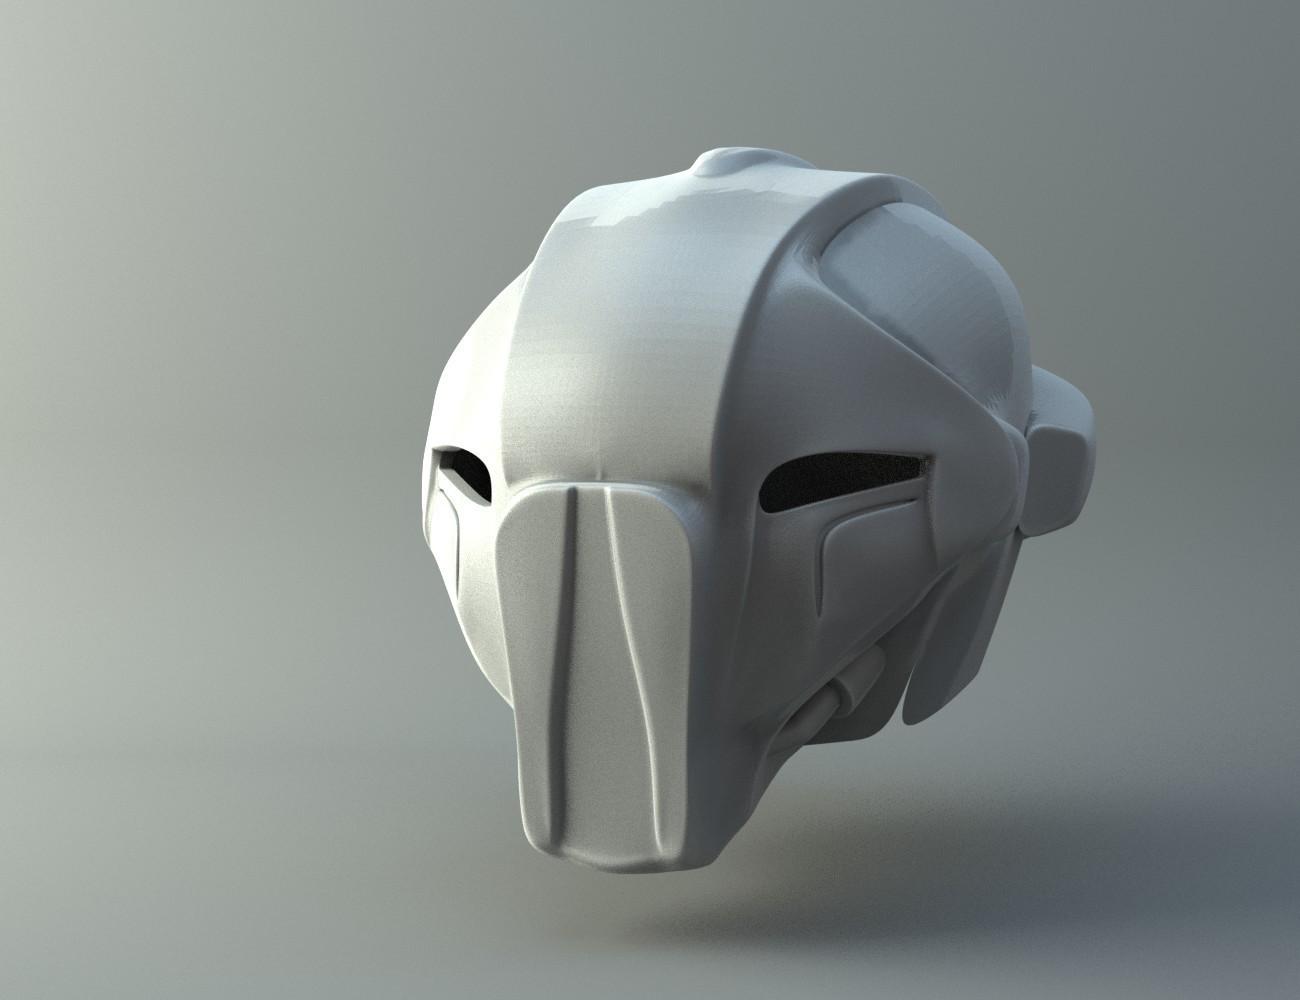 koncept.jpg Download STL file HK47 Assassin Droid - Star Wars - Helmet 3D print model • Template to 3D print, 3D-mon